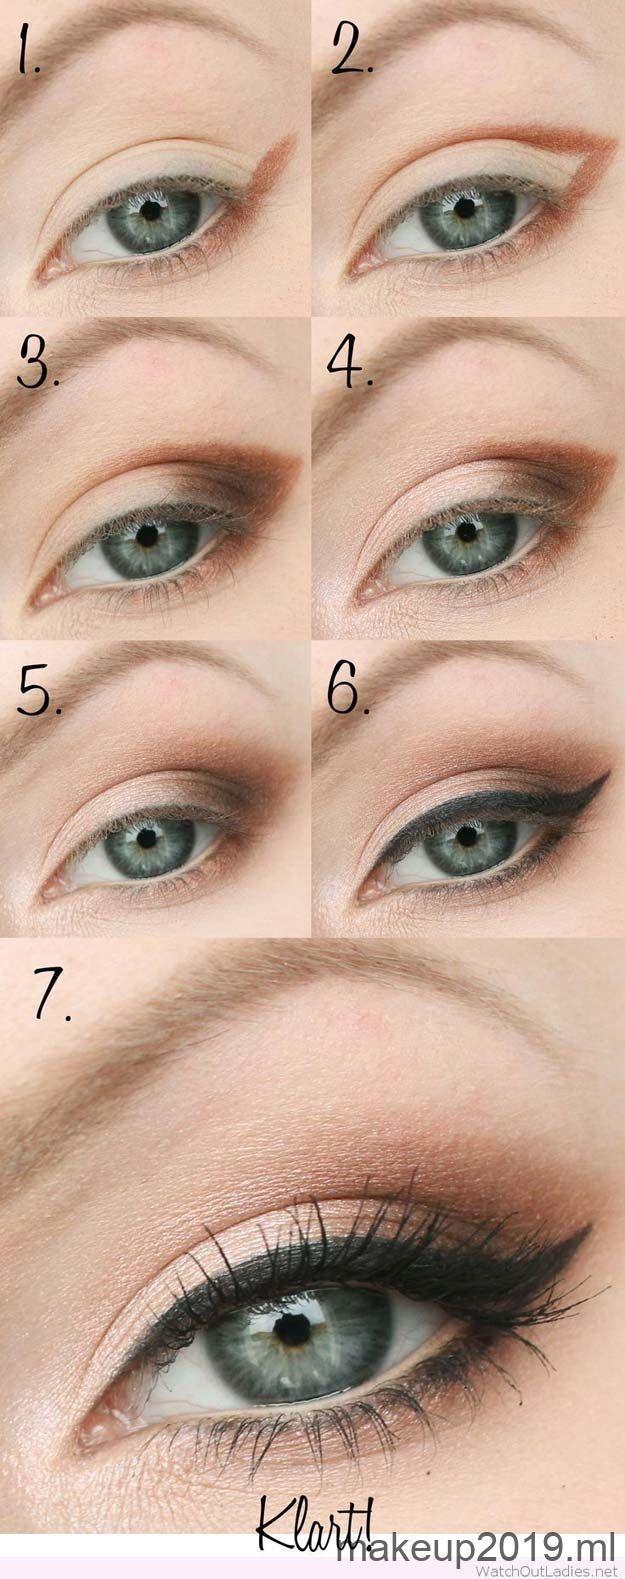 Step by Step Smokey Eye Tutorials  Nude and Black Smokey Eye  Step by Step Tut